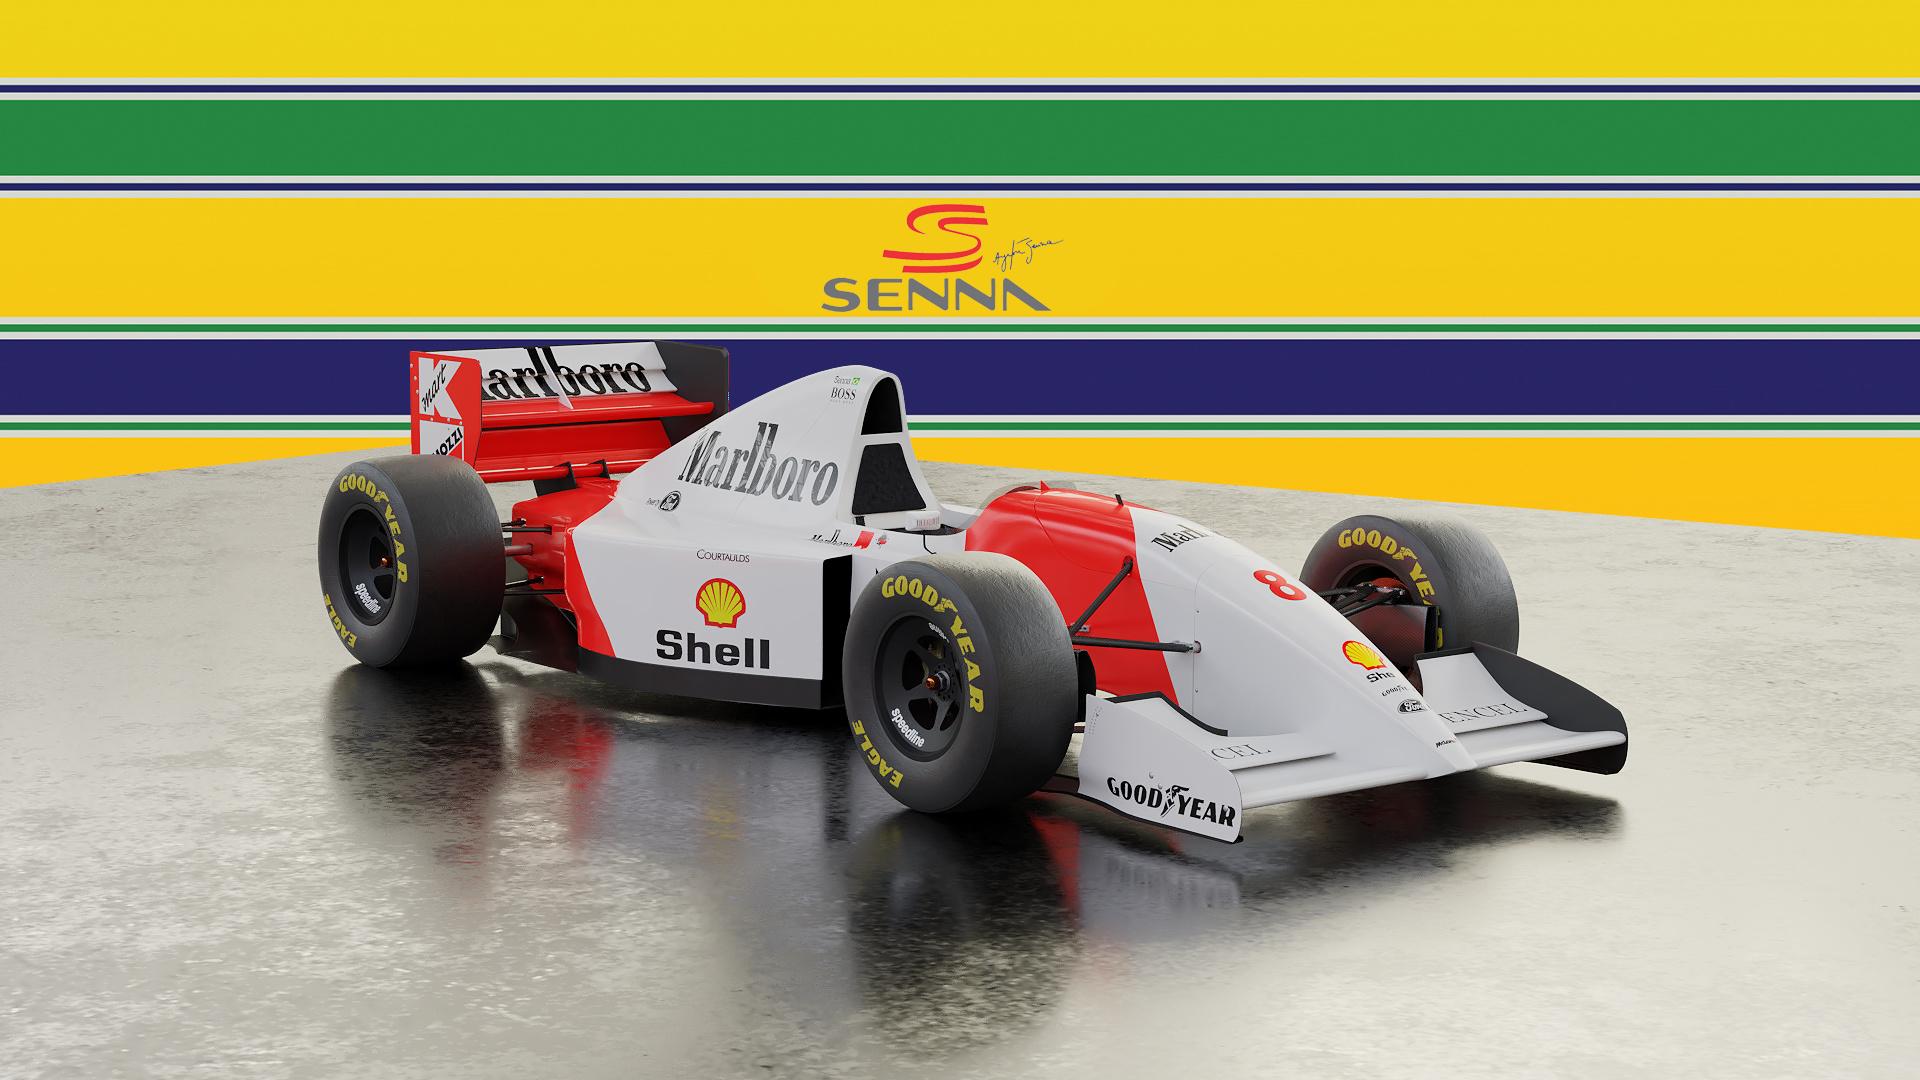 Mclaren Mp4 8 Ayrton Senna Wallpaper Finished Projects